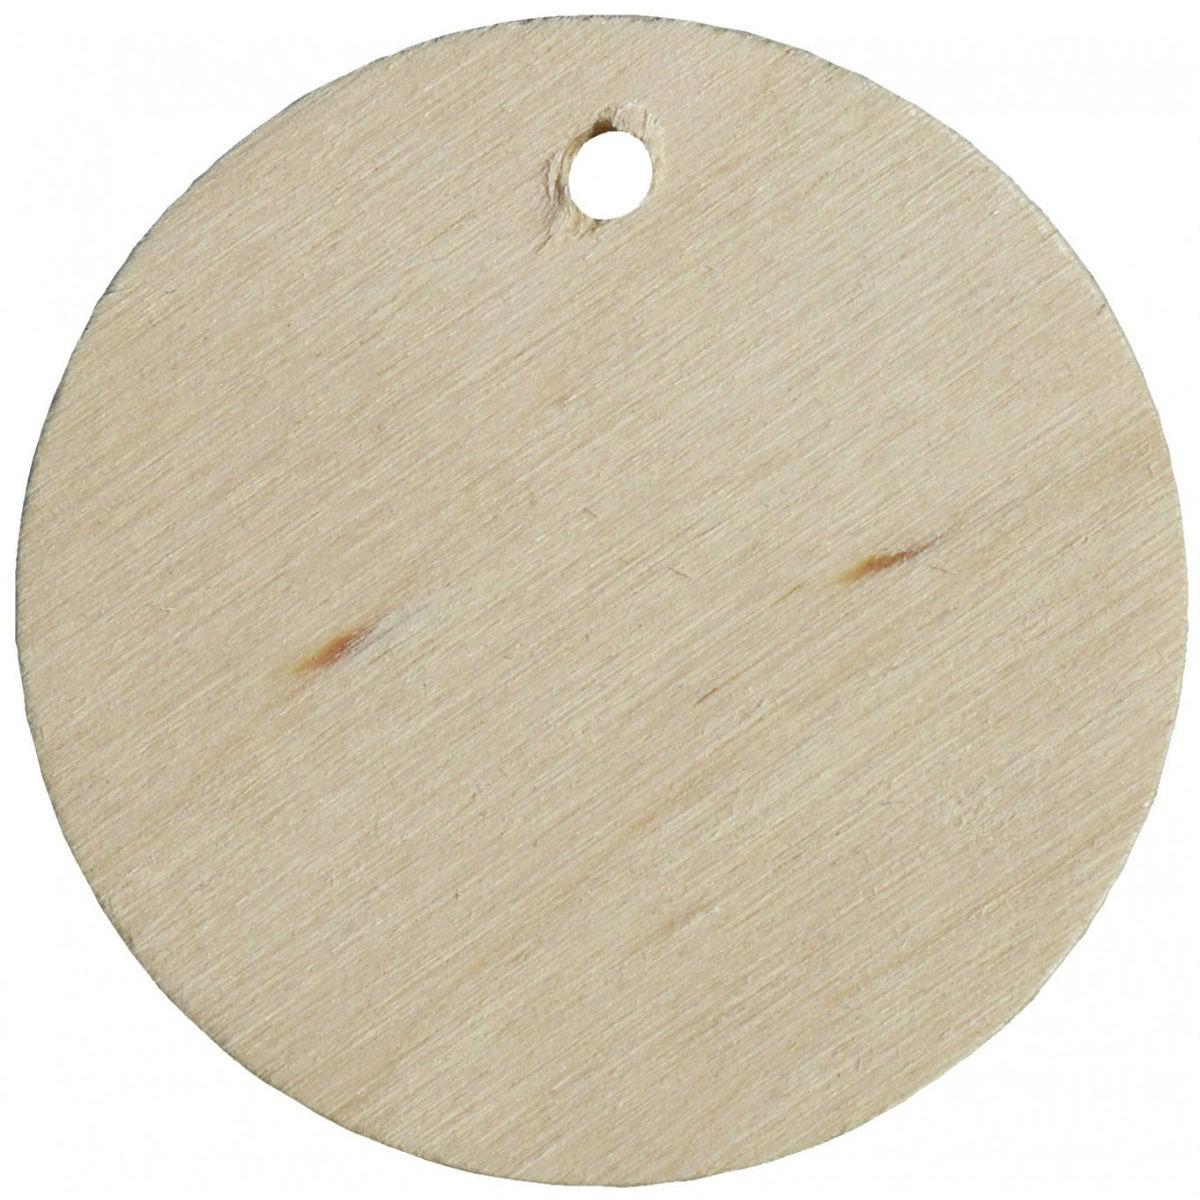 10 holzscheiben rund 5cm namensschild holz zum basteln bemalen beschriften. Black Bedroom Furniture Sets. Home Design Ideas